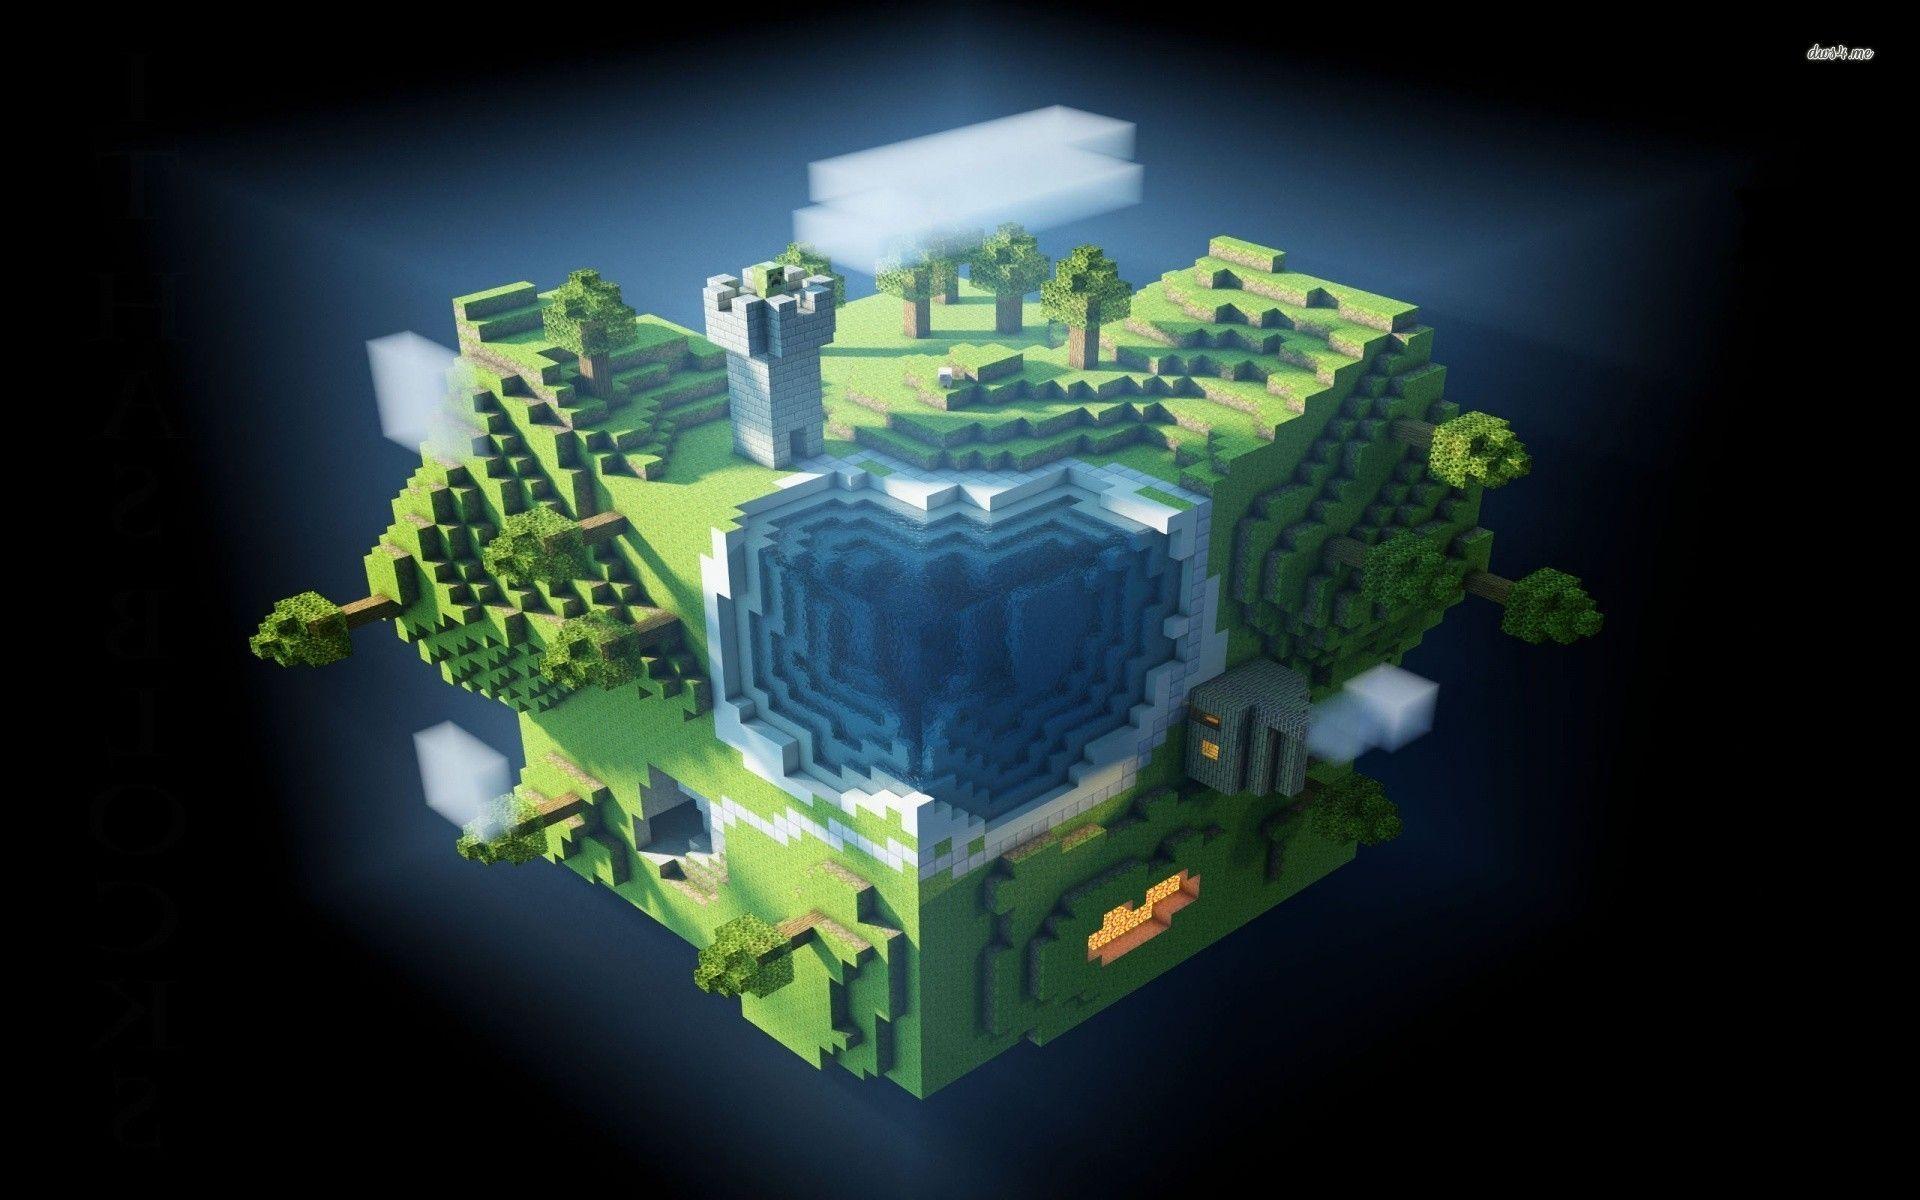 Minecraft Computer Backgrounds - Wallpaper Cave